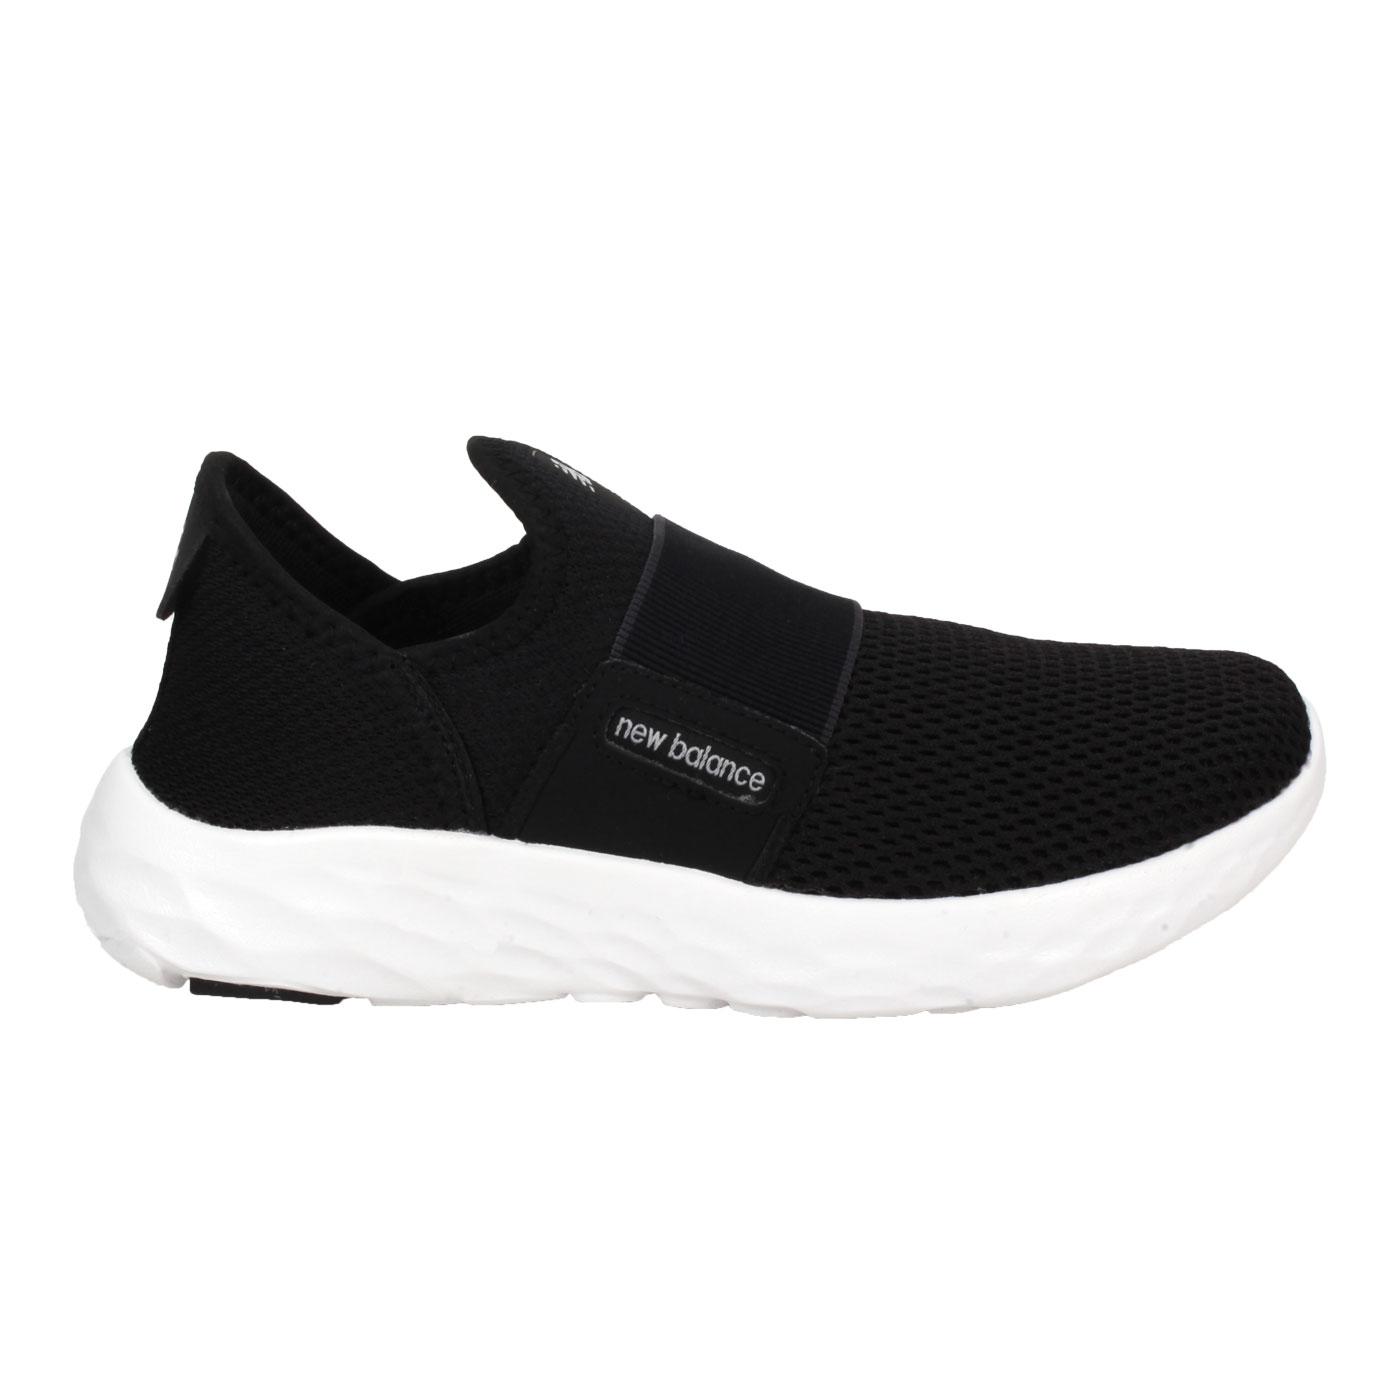 NEW BALANCE 女款運動休閒鞋-WIDE WSPTSSB2